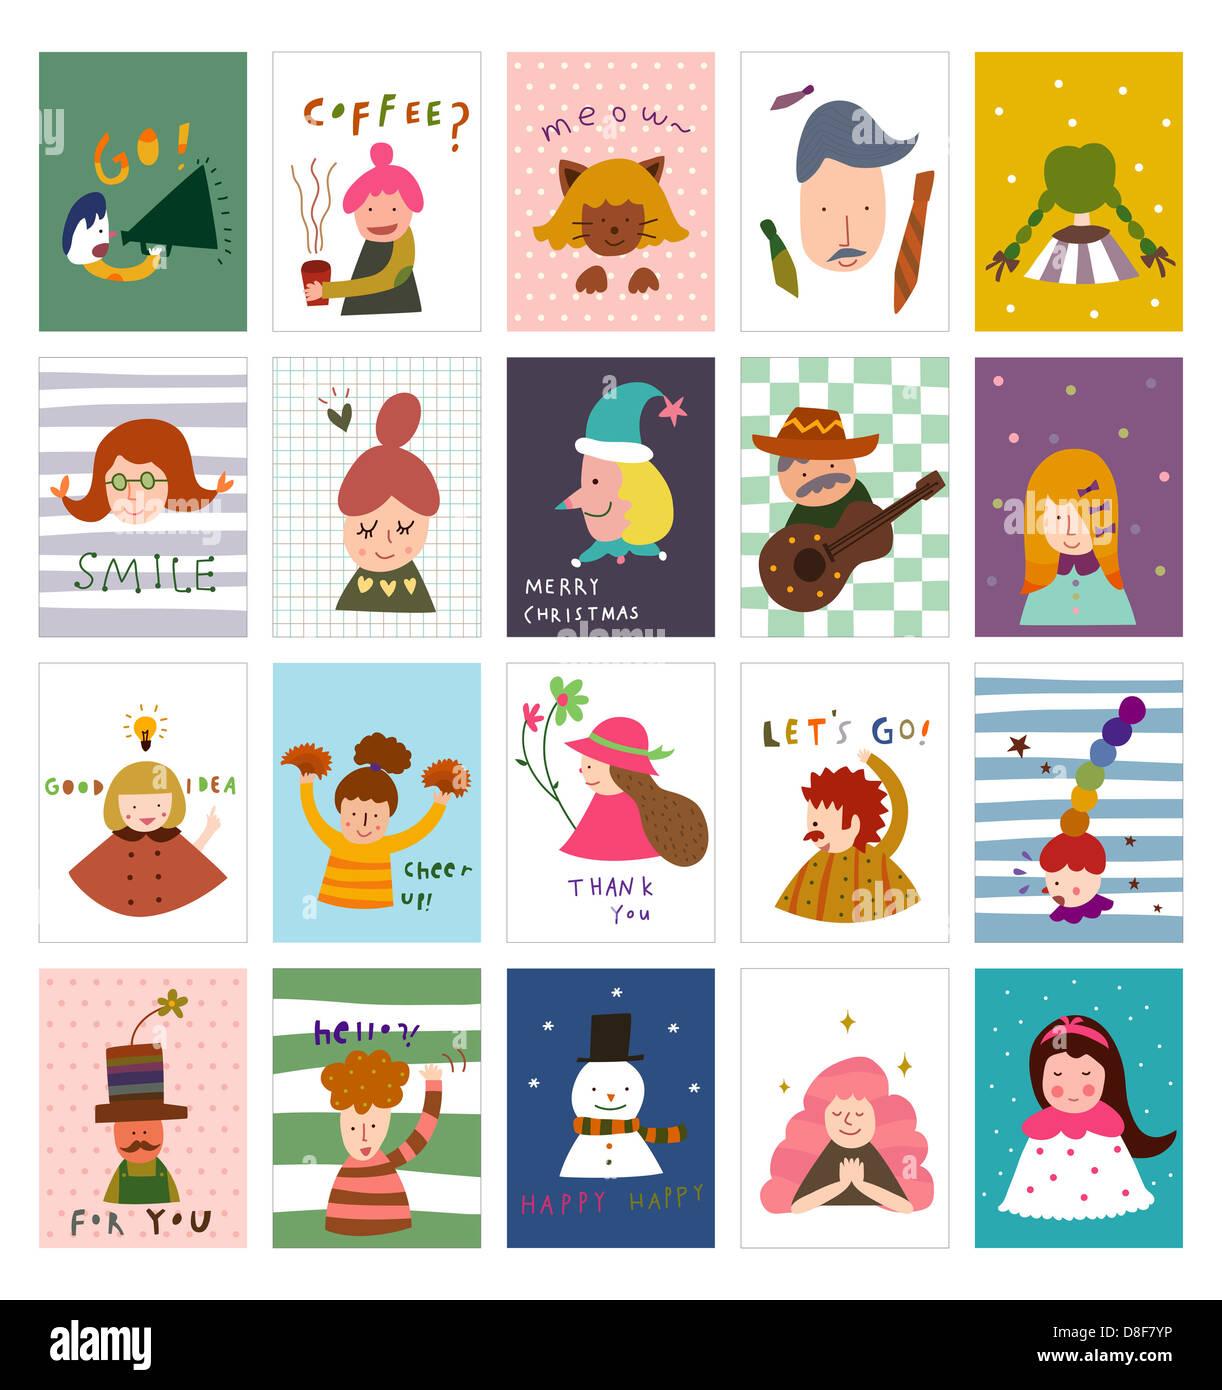 Various postcards - Stock Image